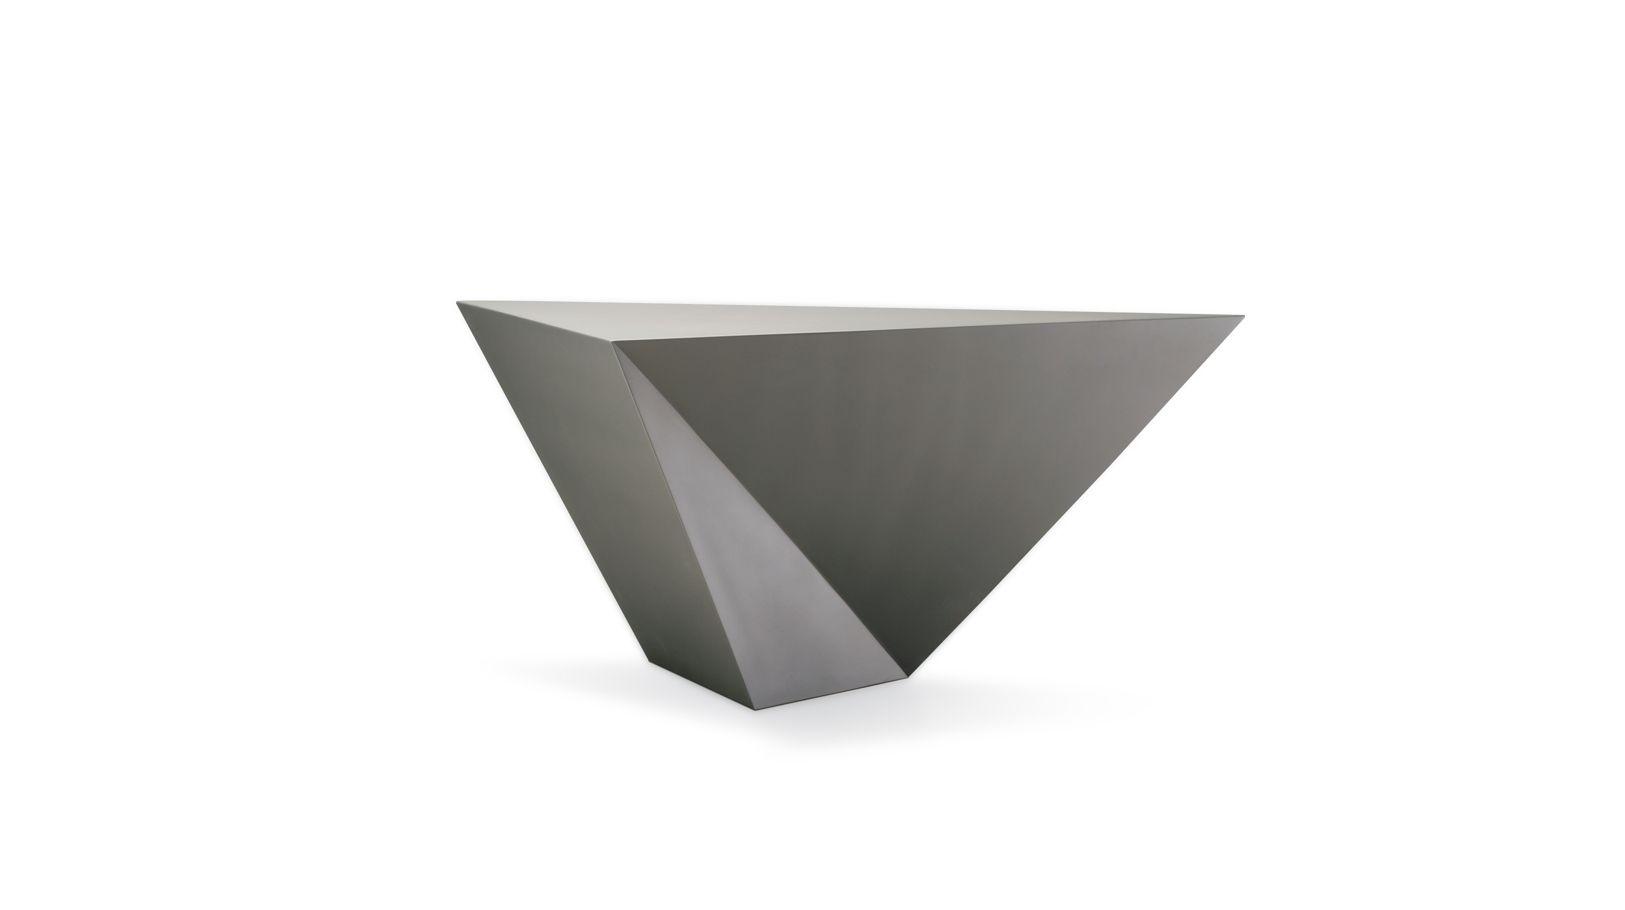 furtif petit bureau roche bobois. Black Bedroom Furniture Sets. Home Design Ideas